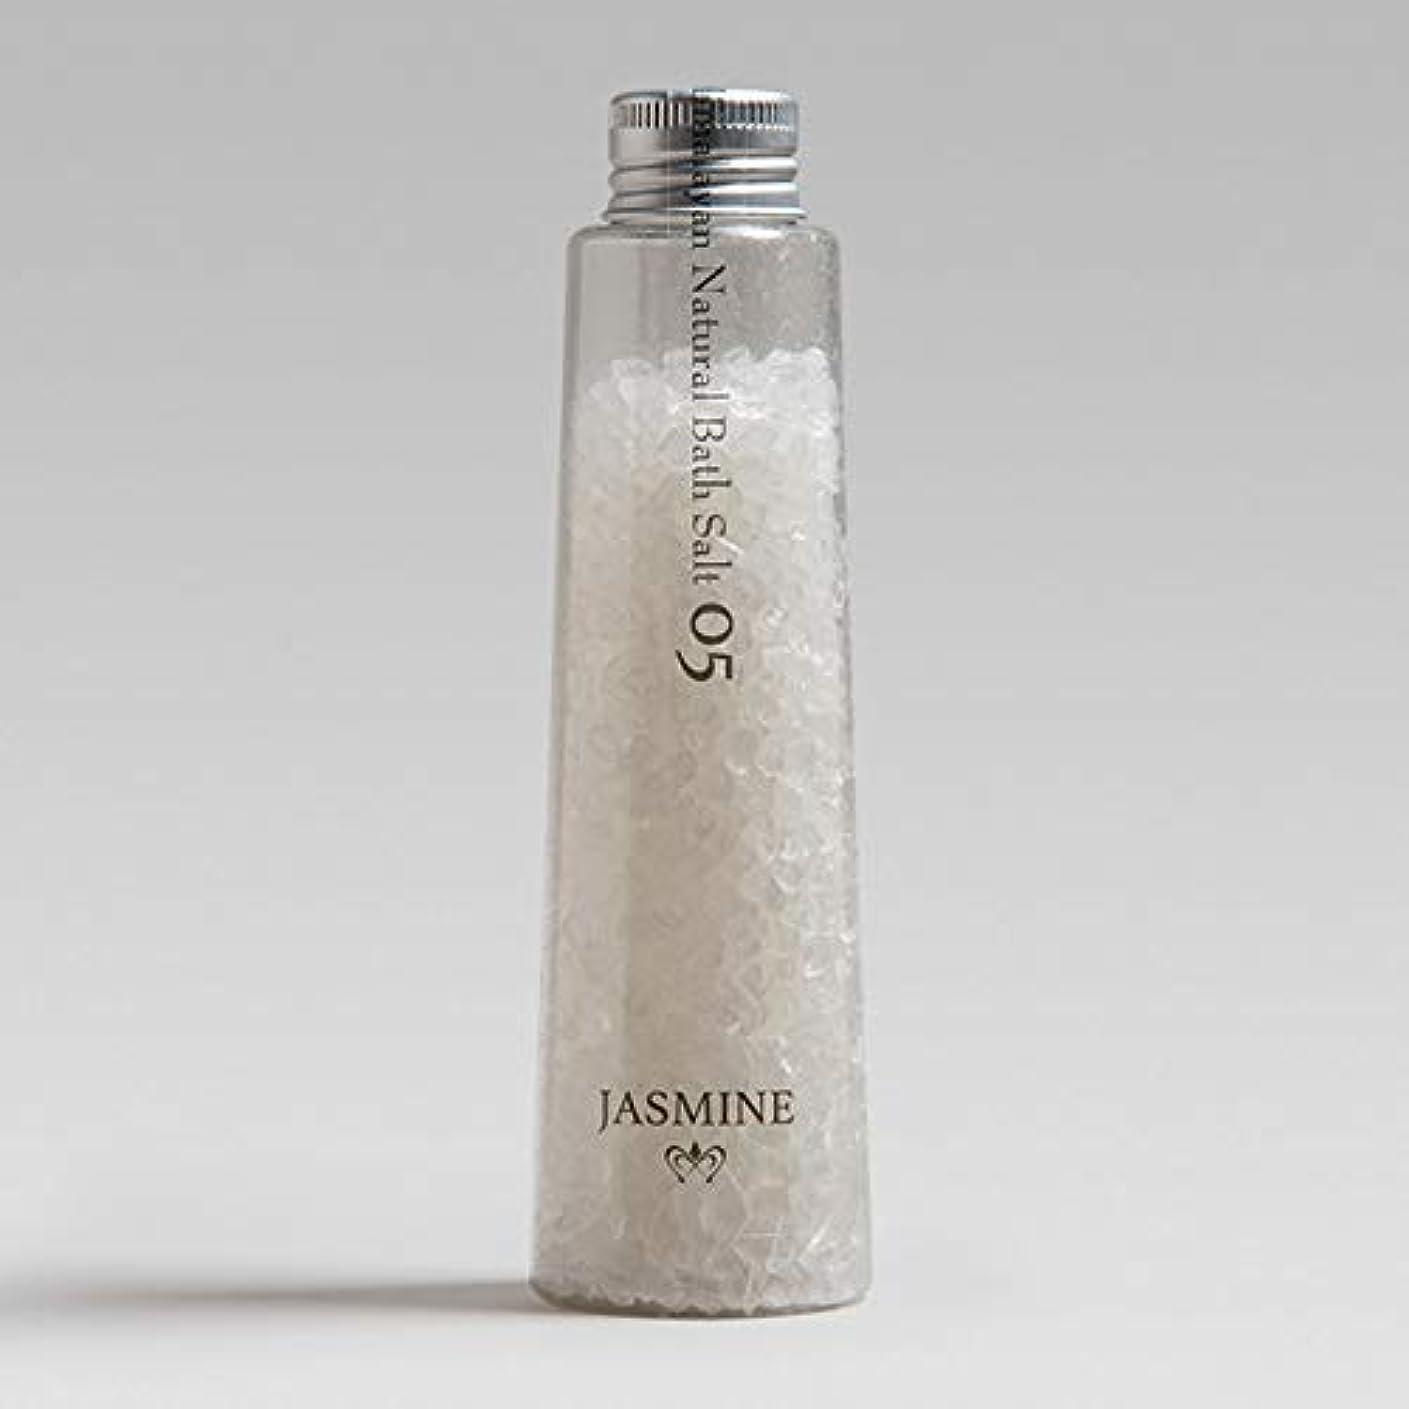 ROSEBAY アロマバスソルト ボトルタイプ170g ジャスミン